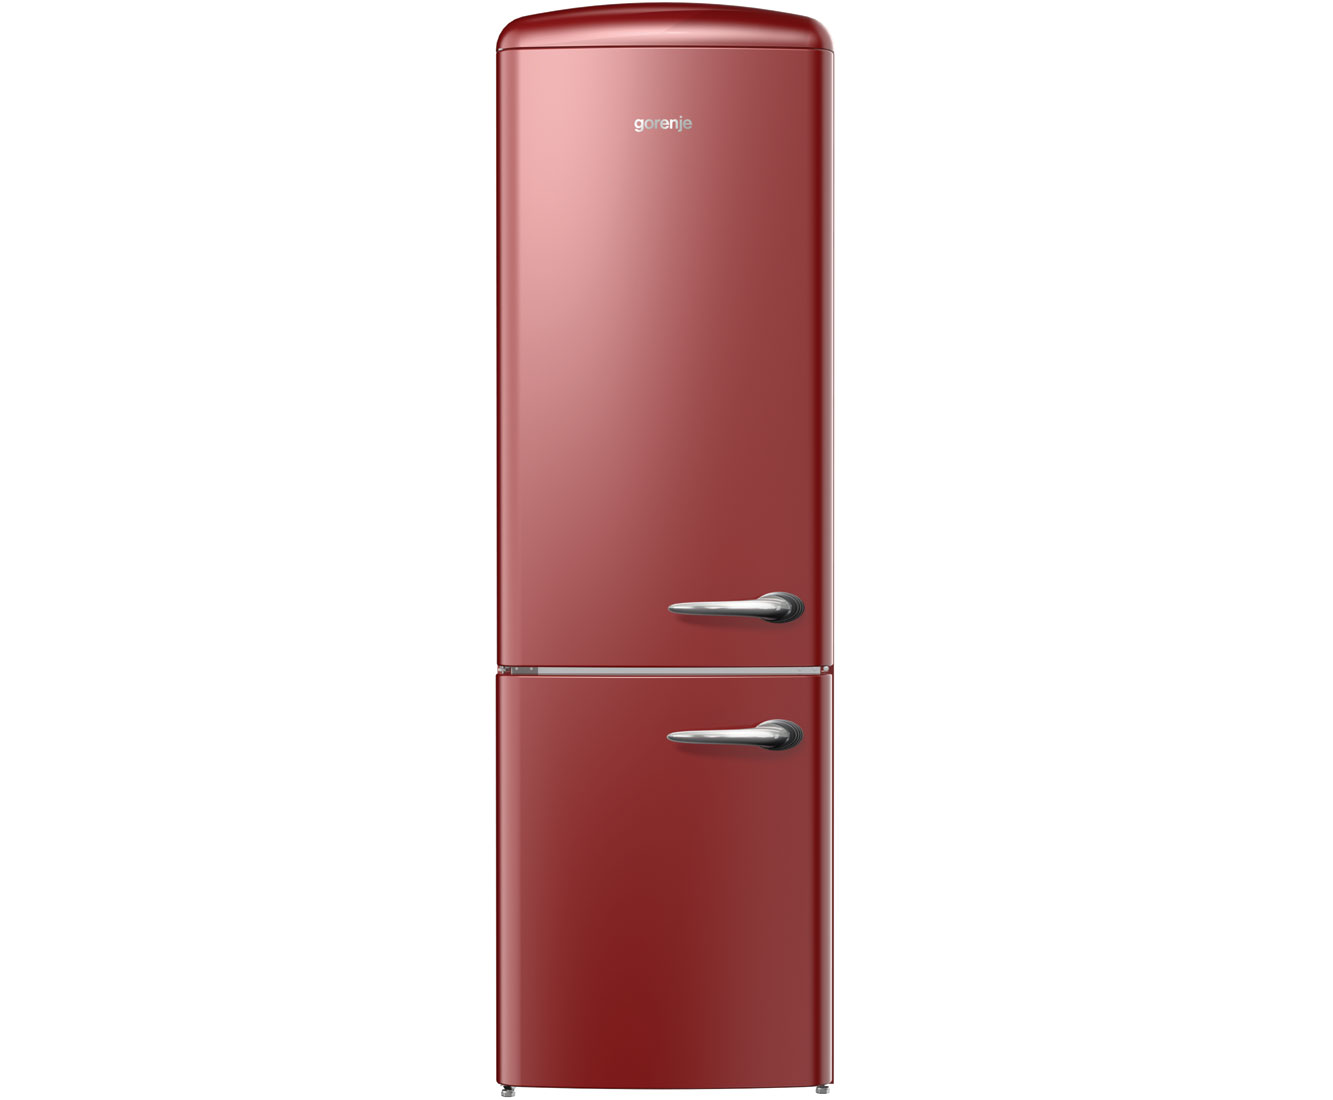 Gorenje Kühlschrank Retro Rot : Gorenje retro kühlschränke als fußball spezial elektrojournal